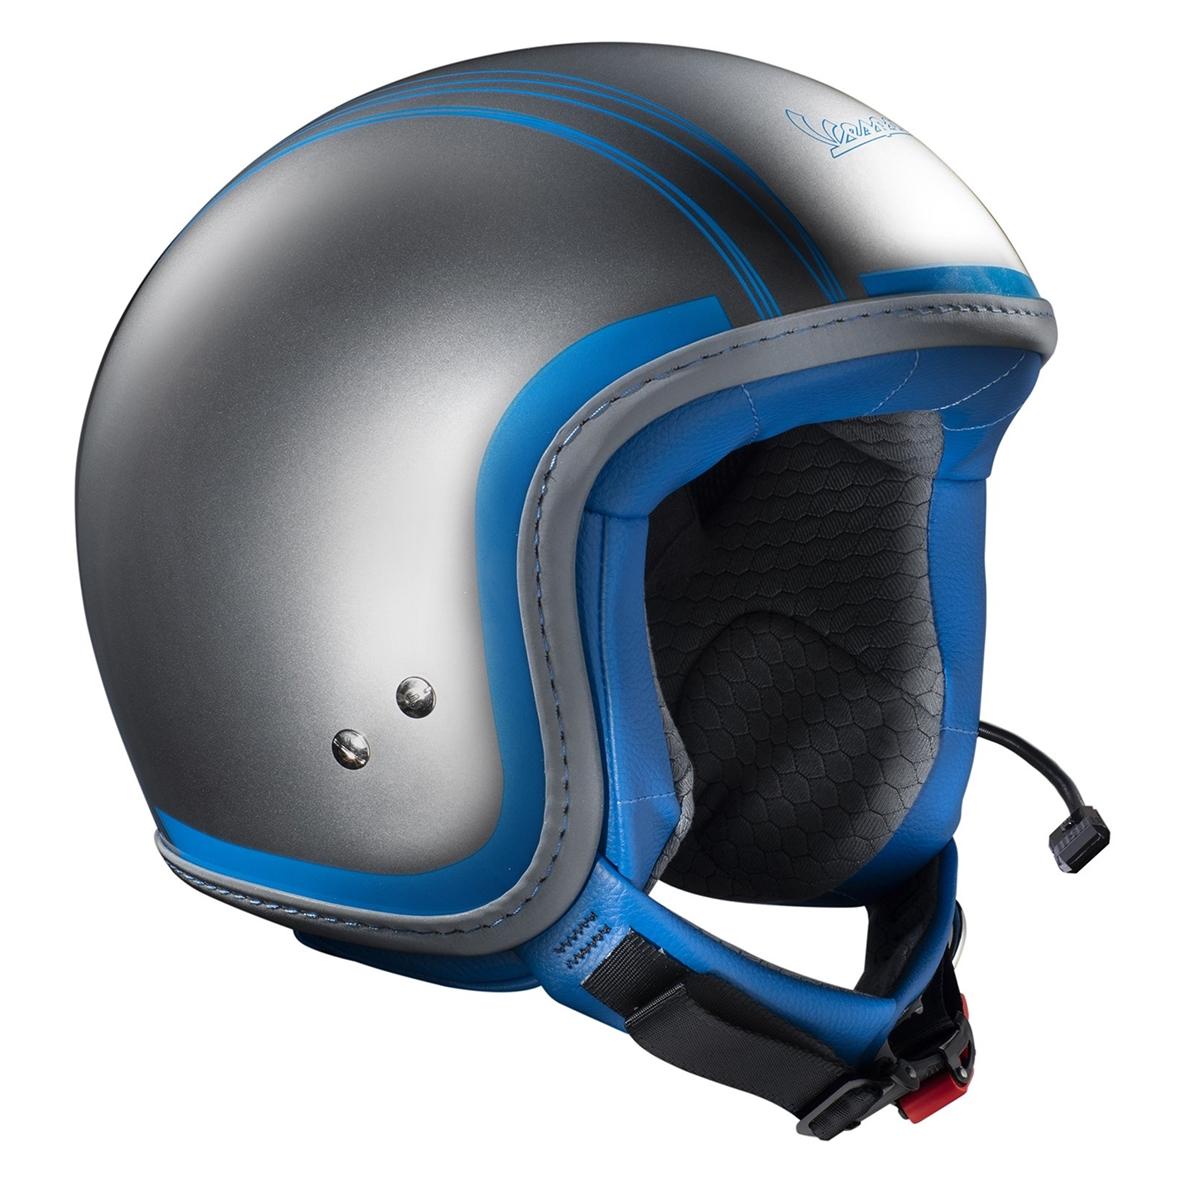 Product Image for 'Helmet PIAGGIO Vespa Elettrica TECH BluetoothTitle'